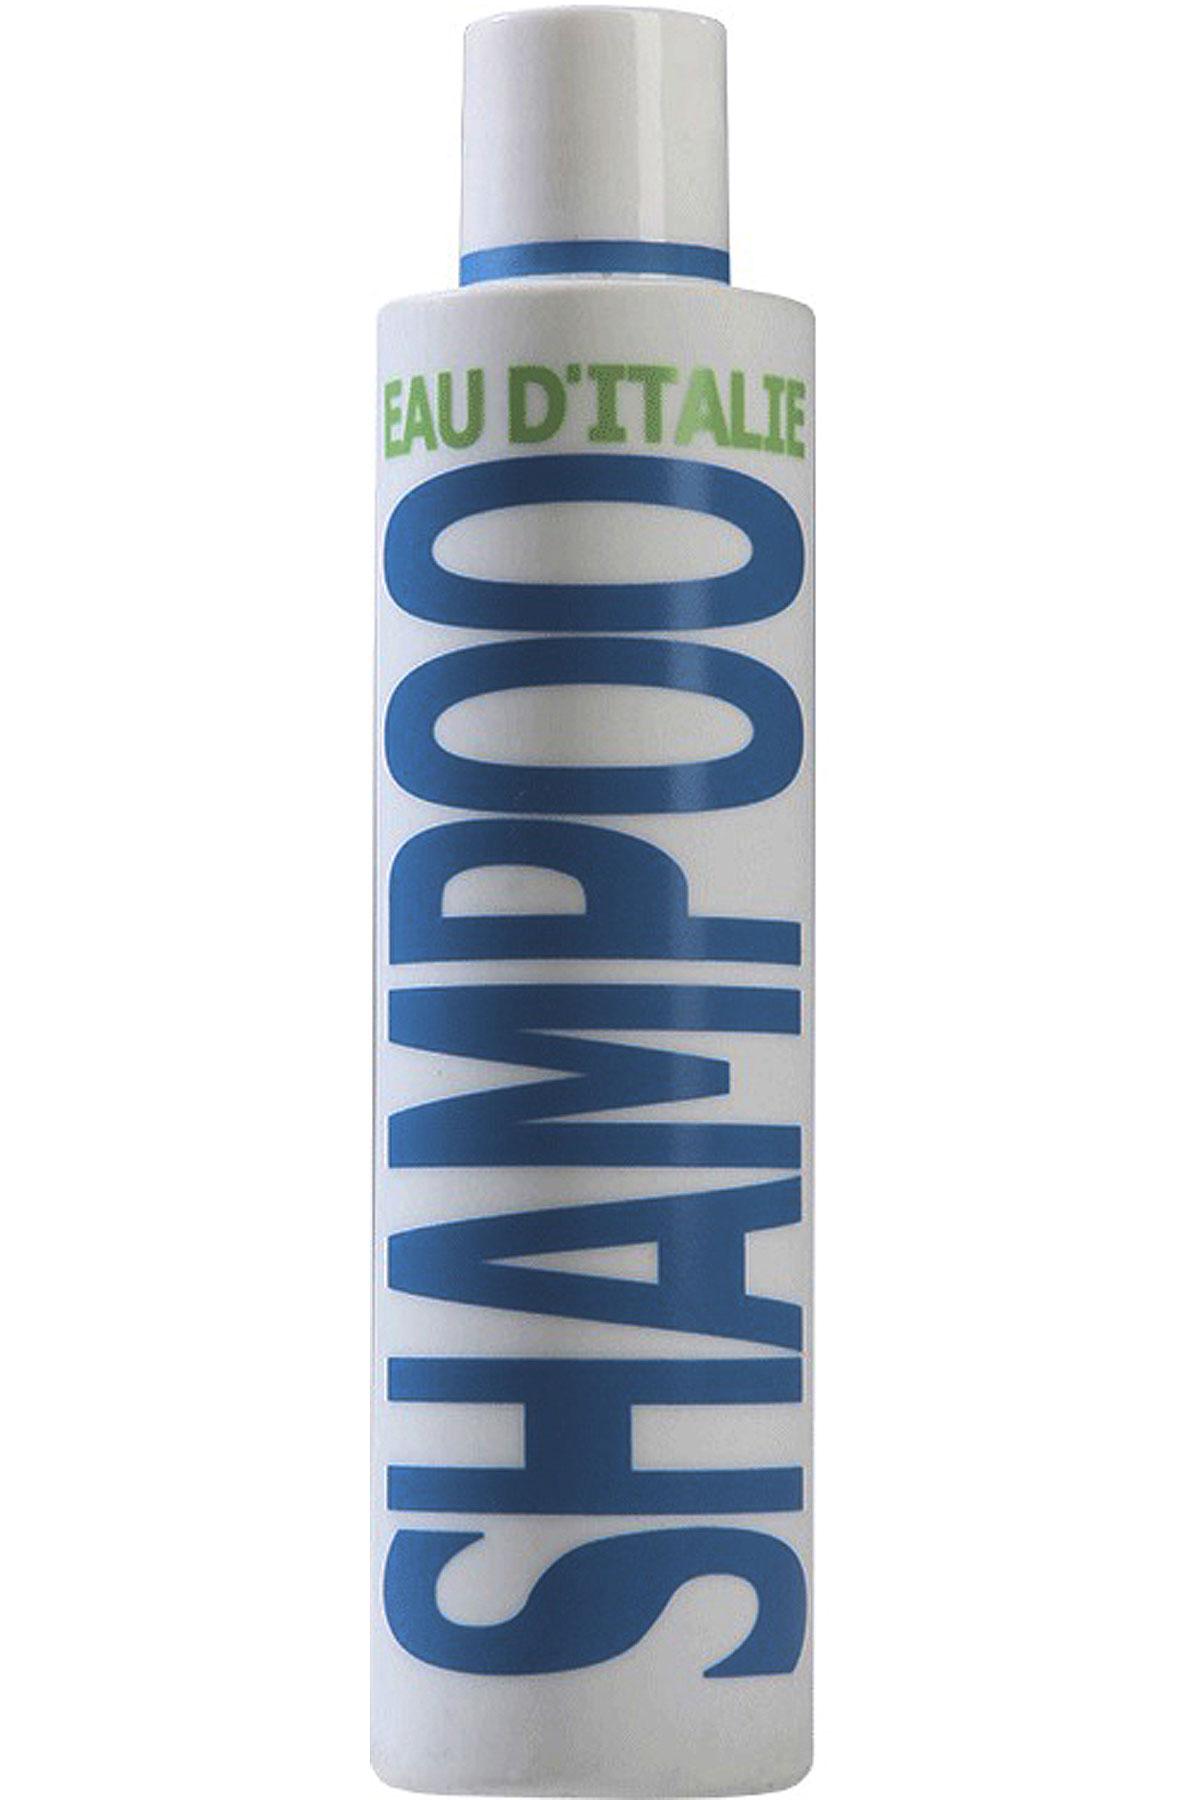 Eau D Italie Beauty for Women, Eau D Italie - Shampoo - 200 Ml, 2019, 200 ml